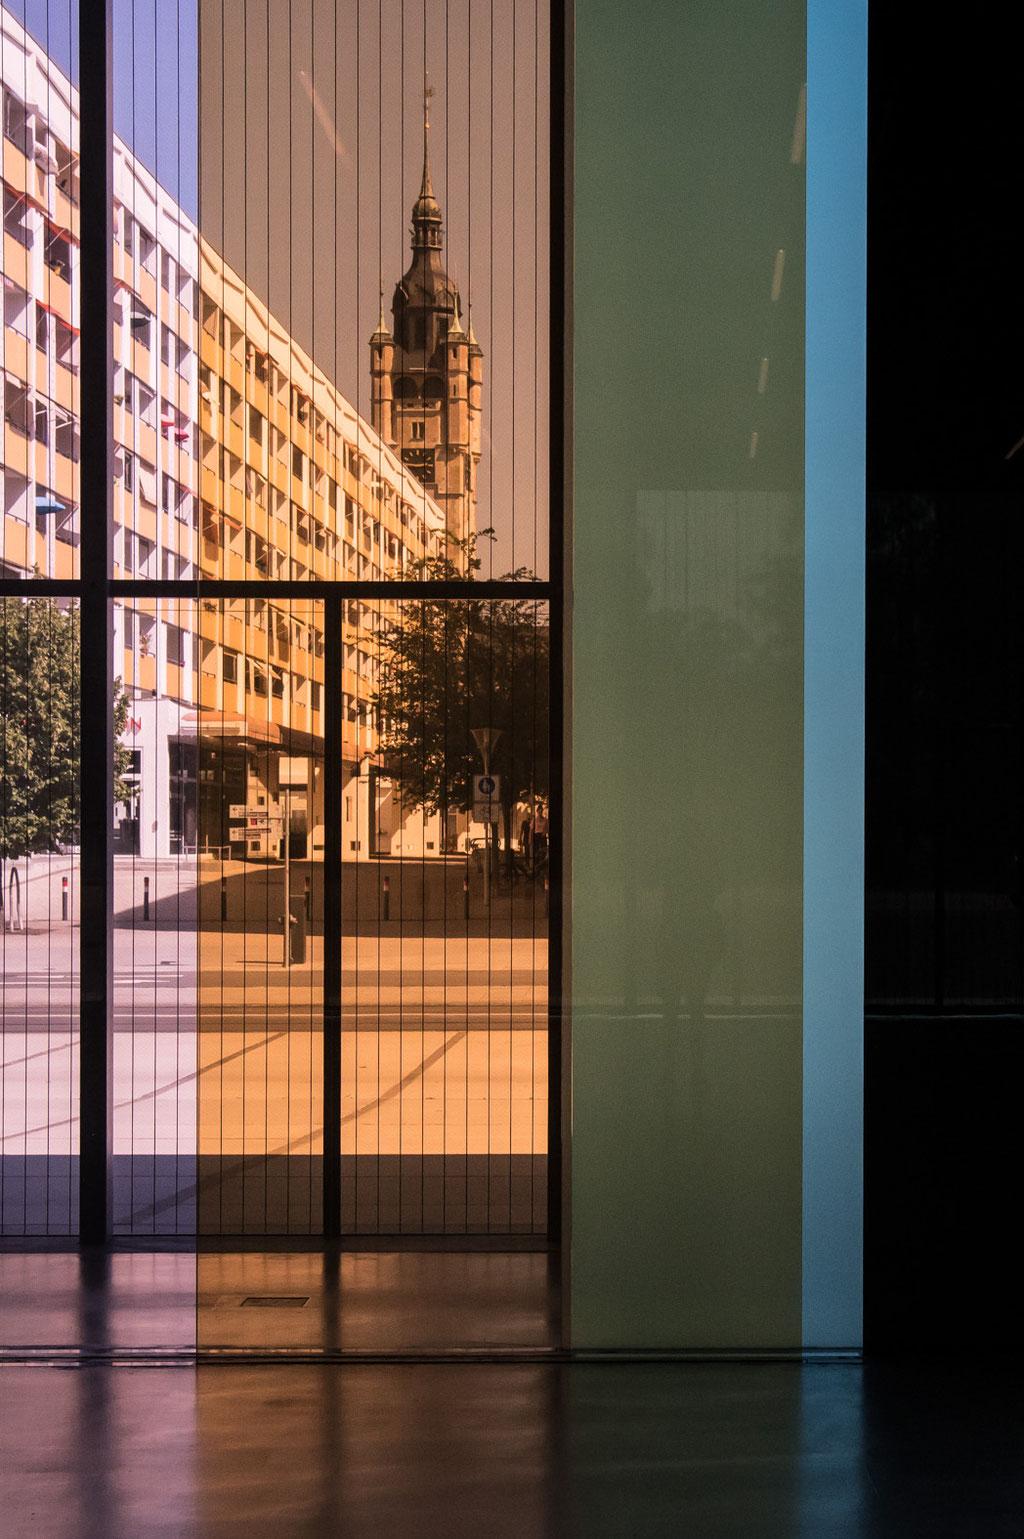 Bauhaus Museum (González Hinz Zabala (addenda architects)), Glasinstallation/glass installation (Lucy Raven), Dessau (D)